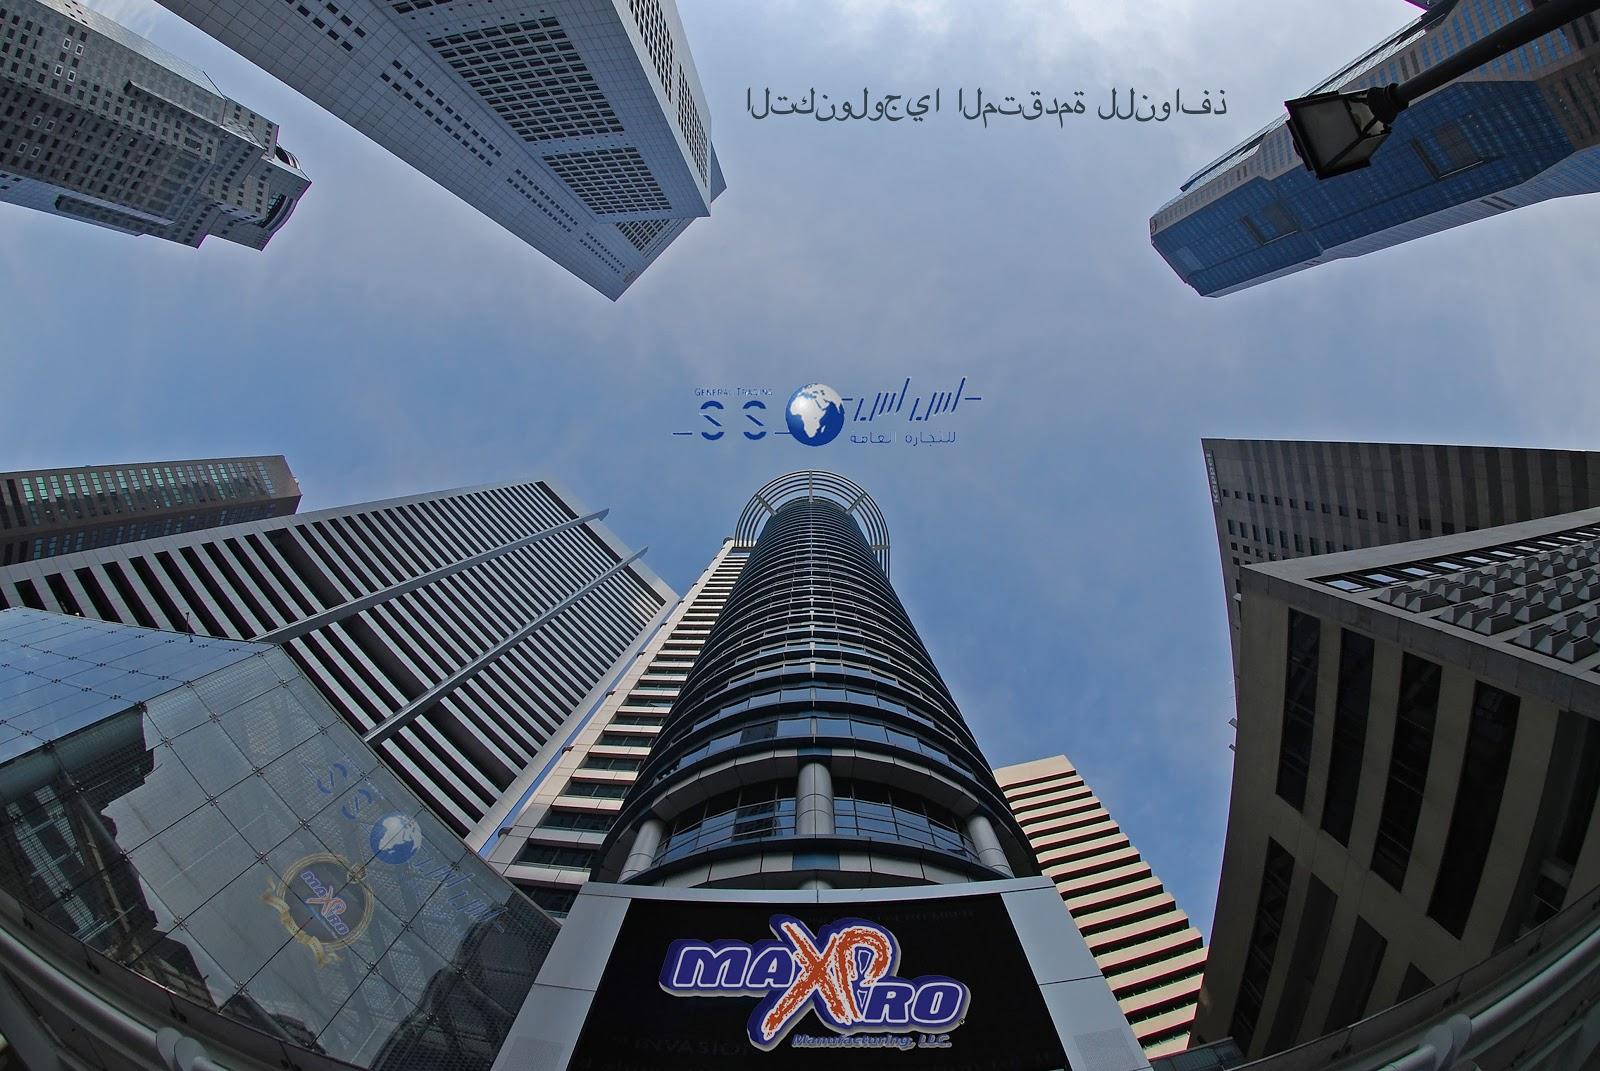 List of general trading companies in dubai